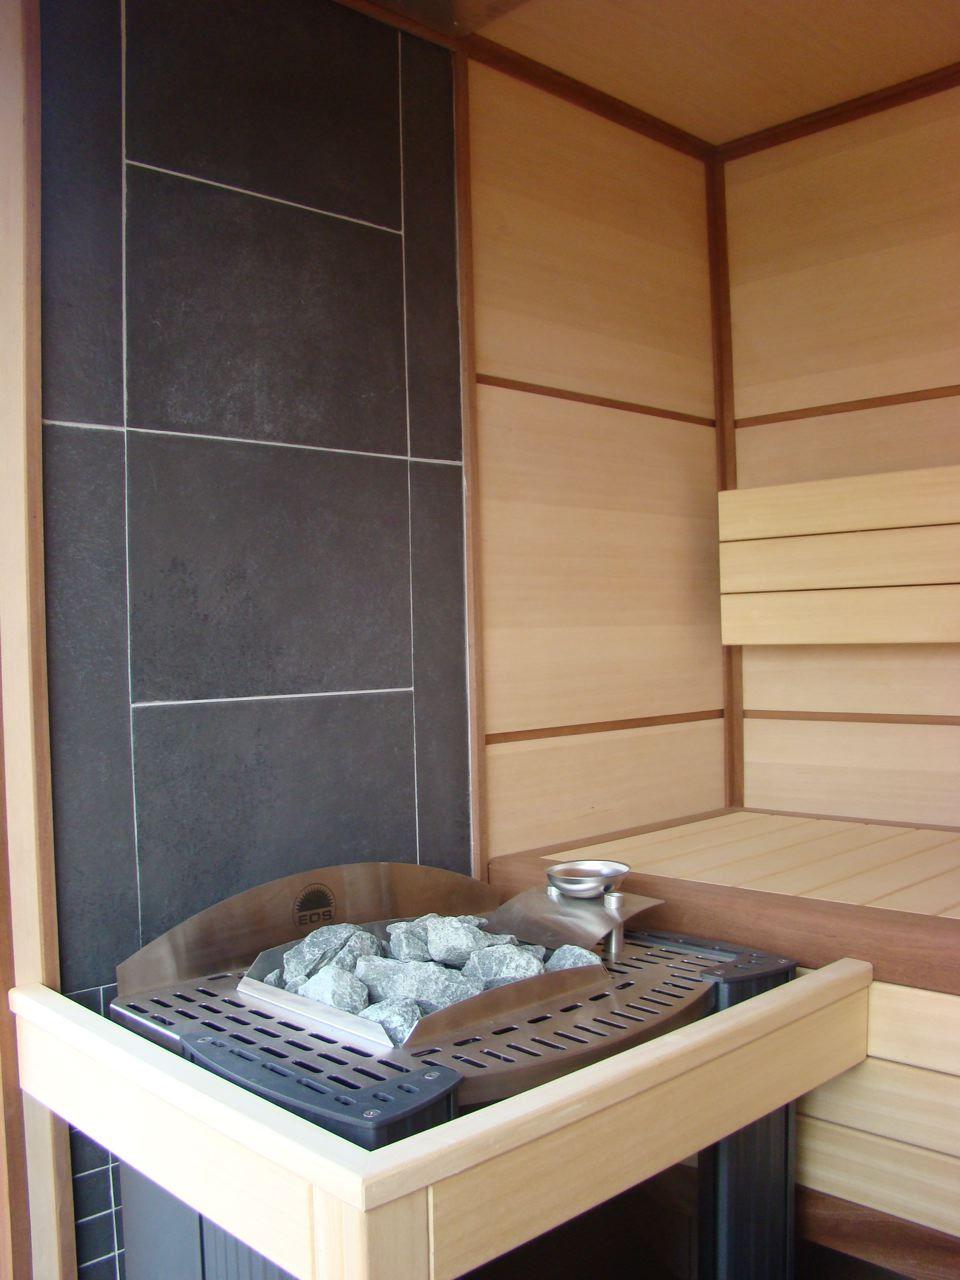 Sauna Saunaville Www Saunaville Com: Пин от пользователя Yurich на доске Баня. Сауна. Sauna